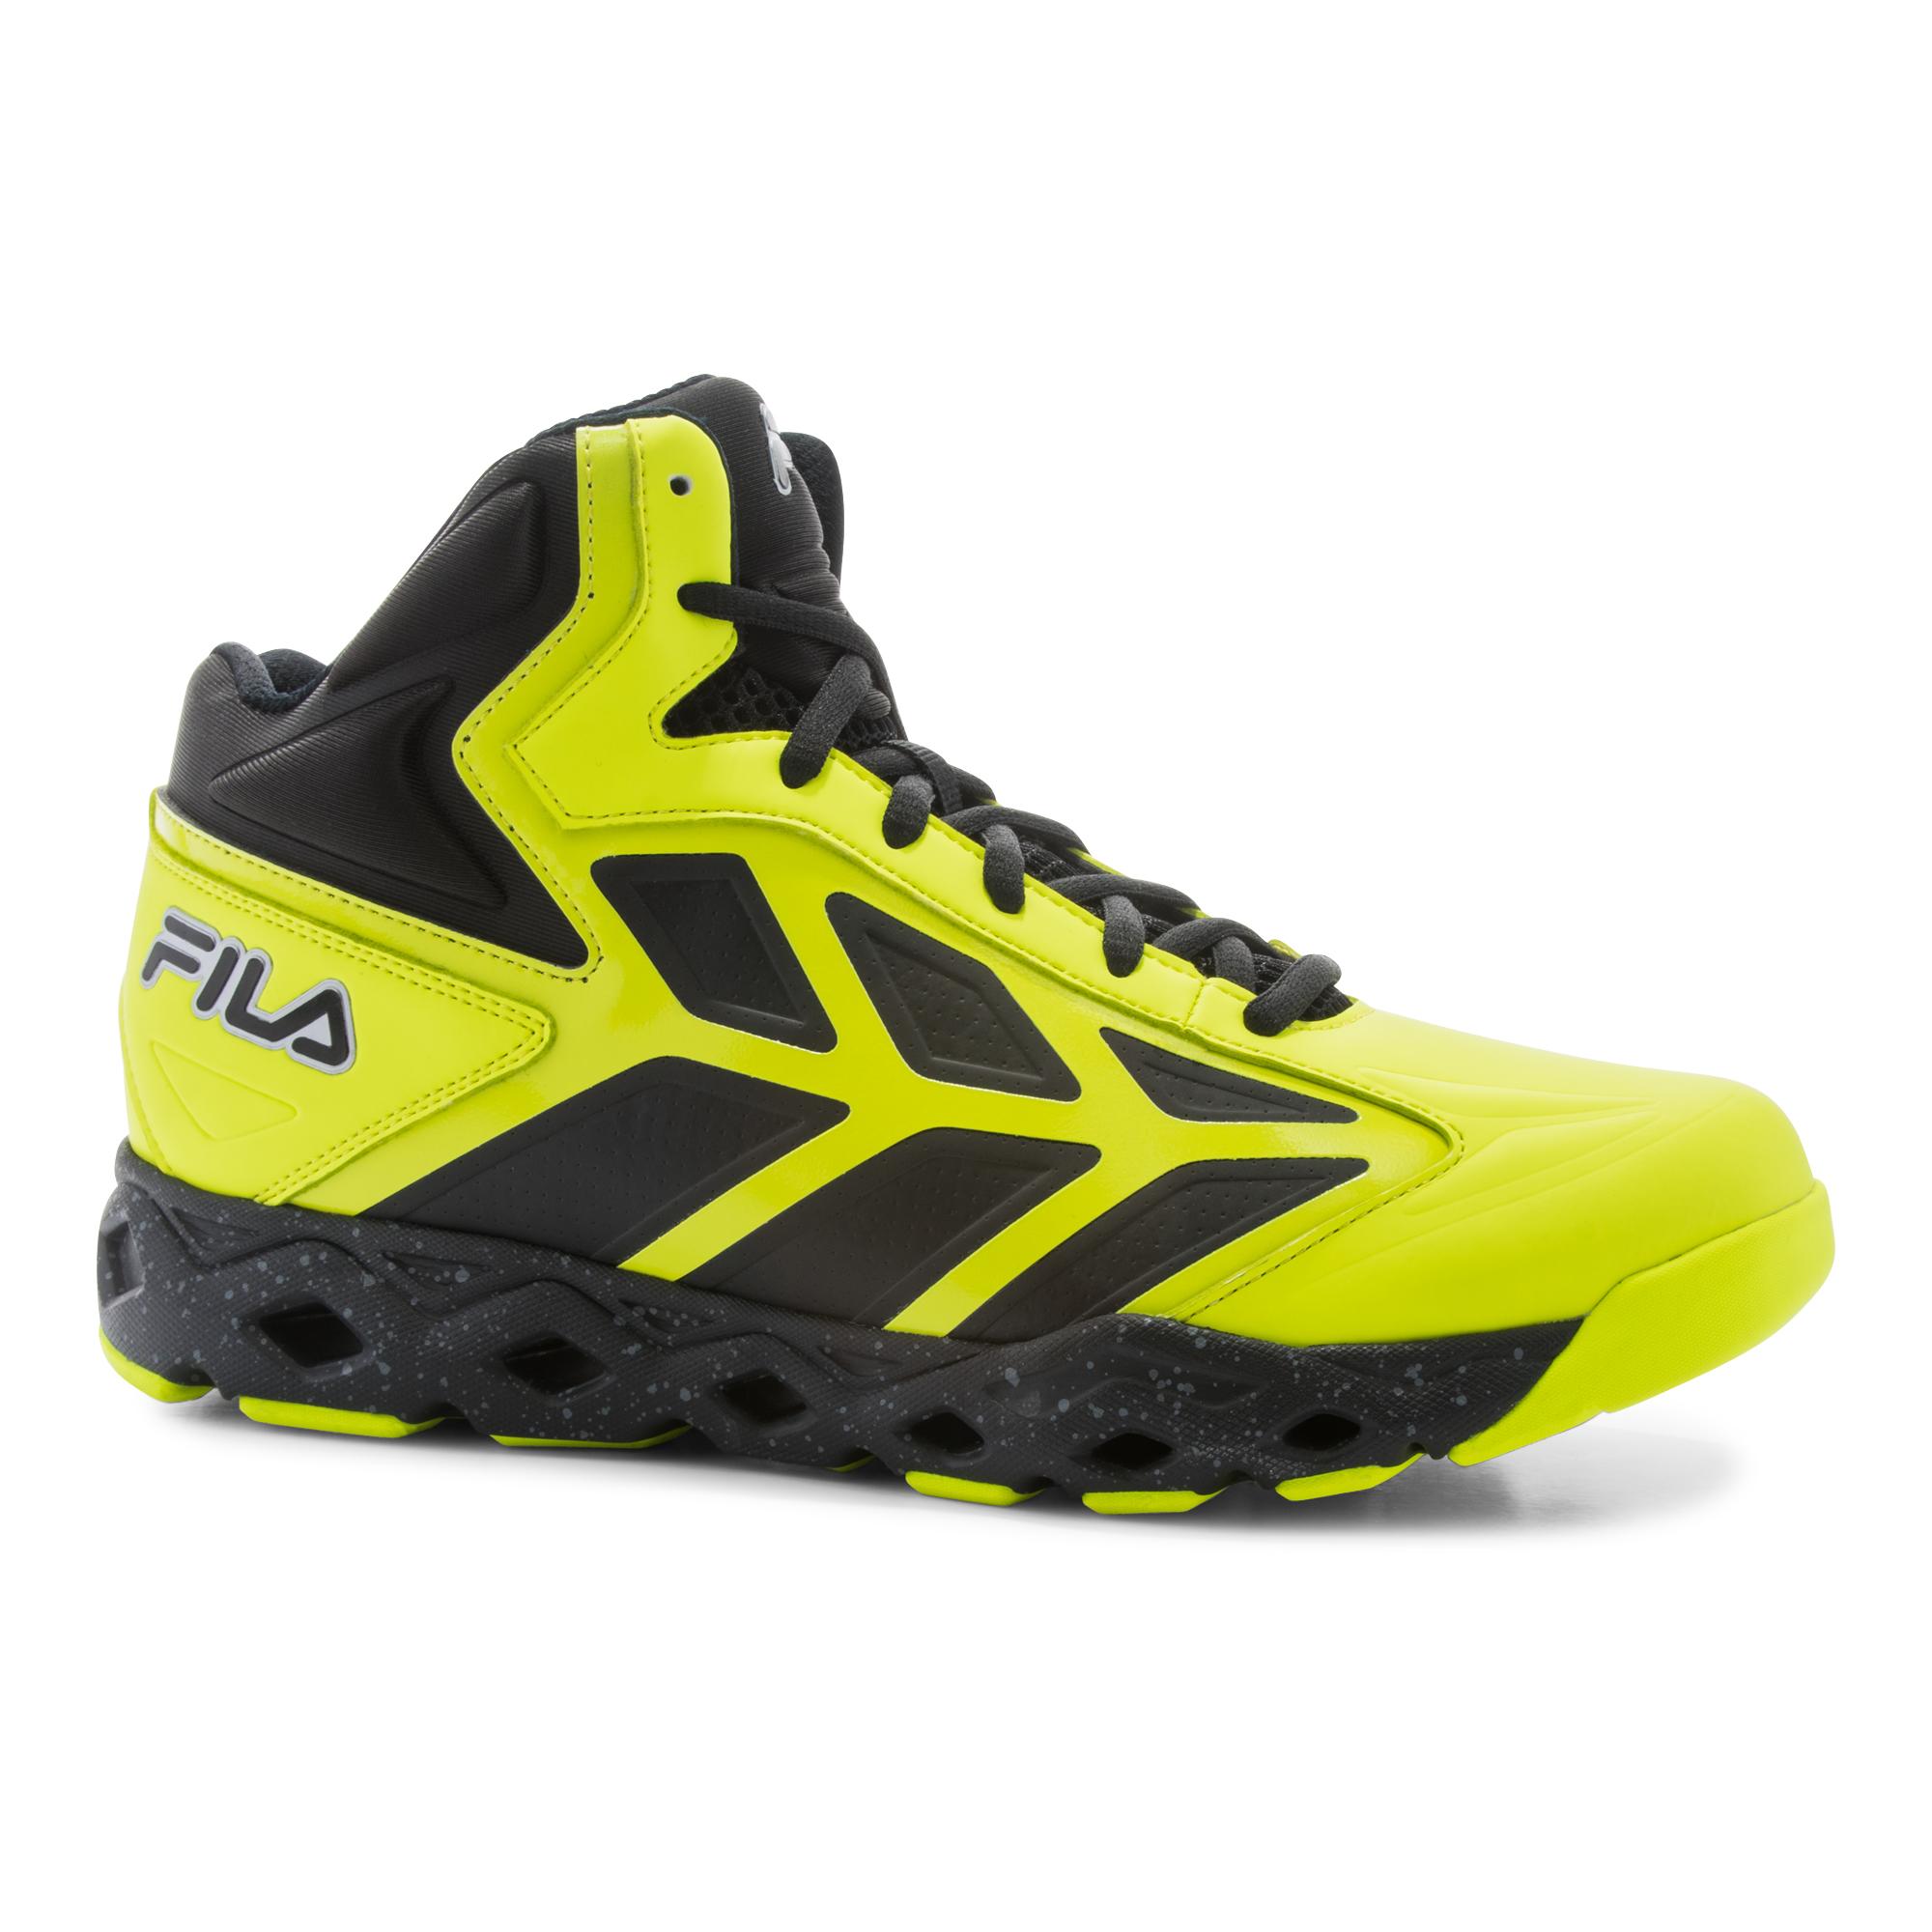 fila basketball shoes mens price Sale